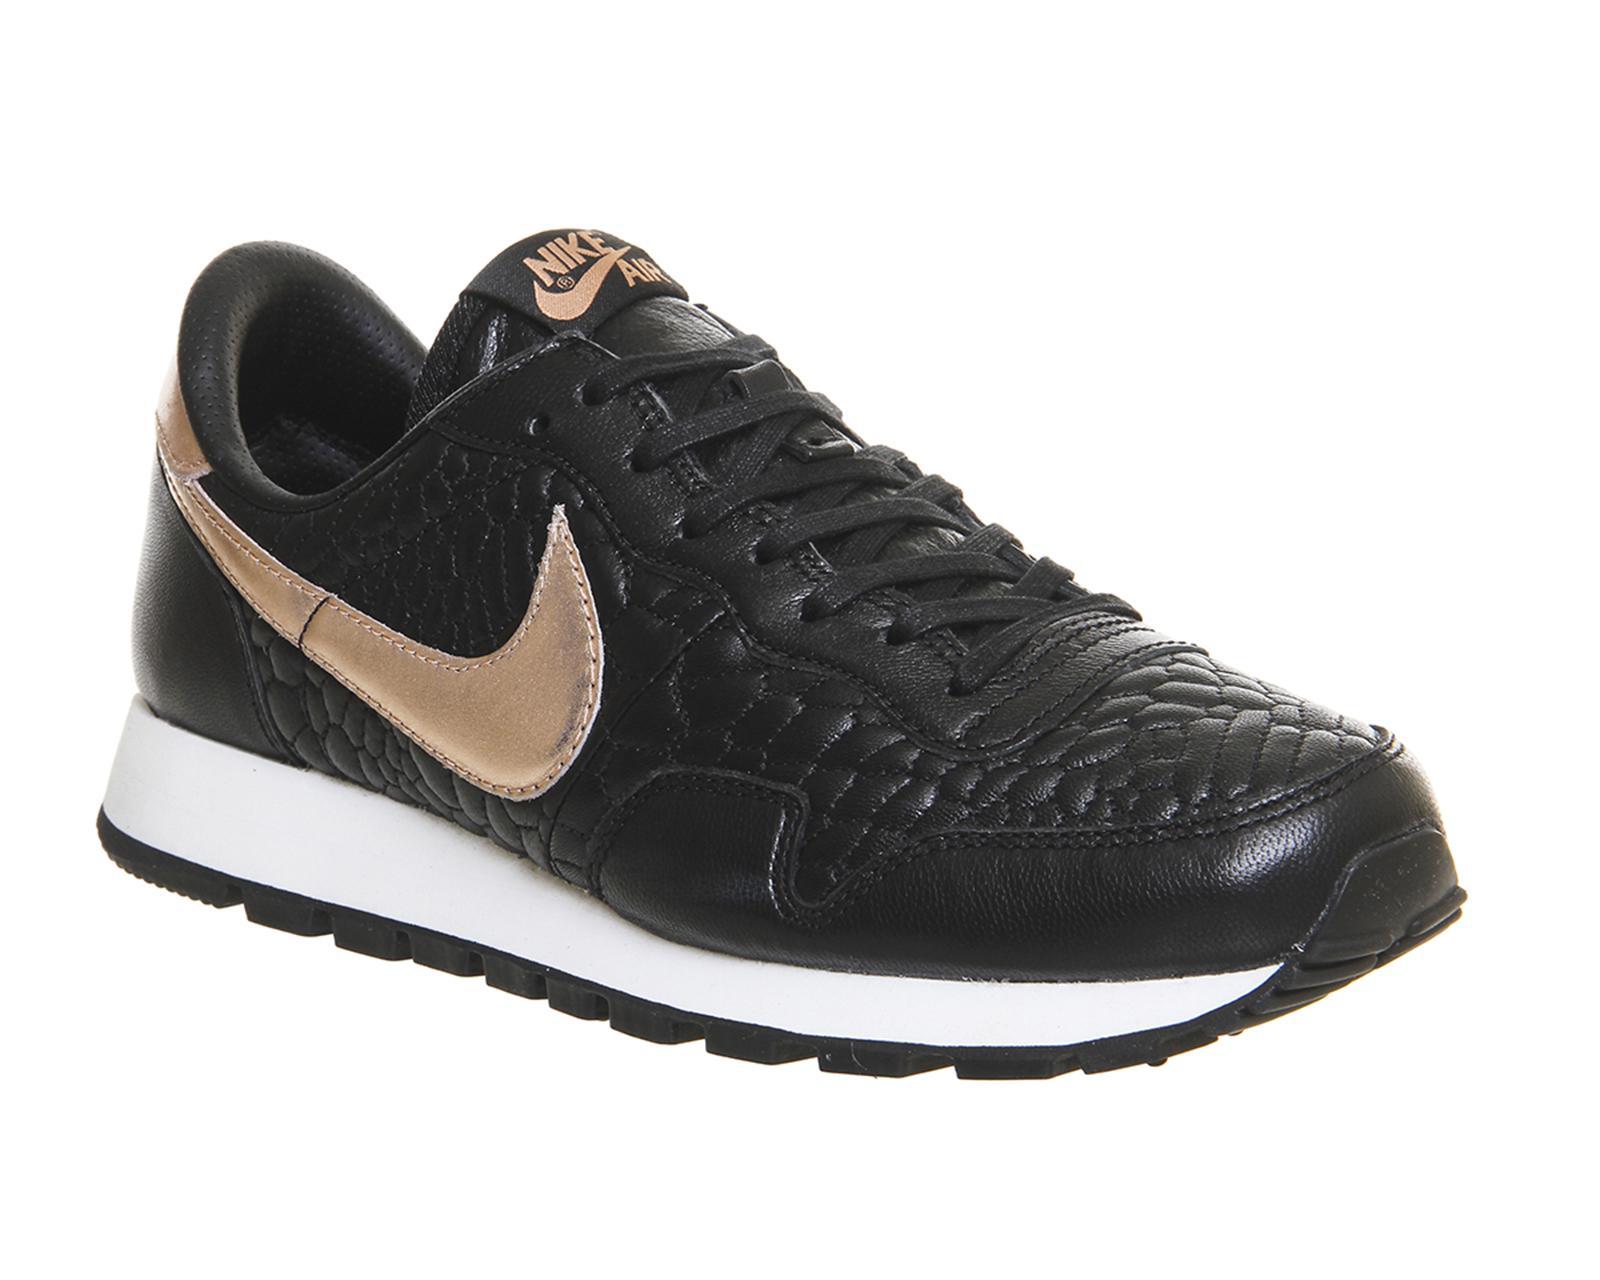 sale retailer a5976 10d7f Lyst - Nike Air Pegasus 83 in Black